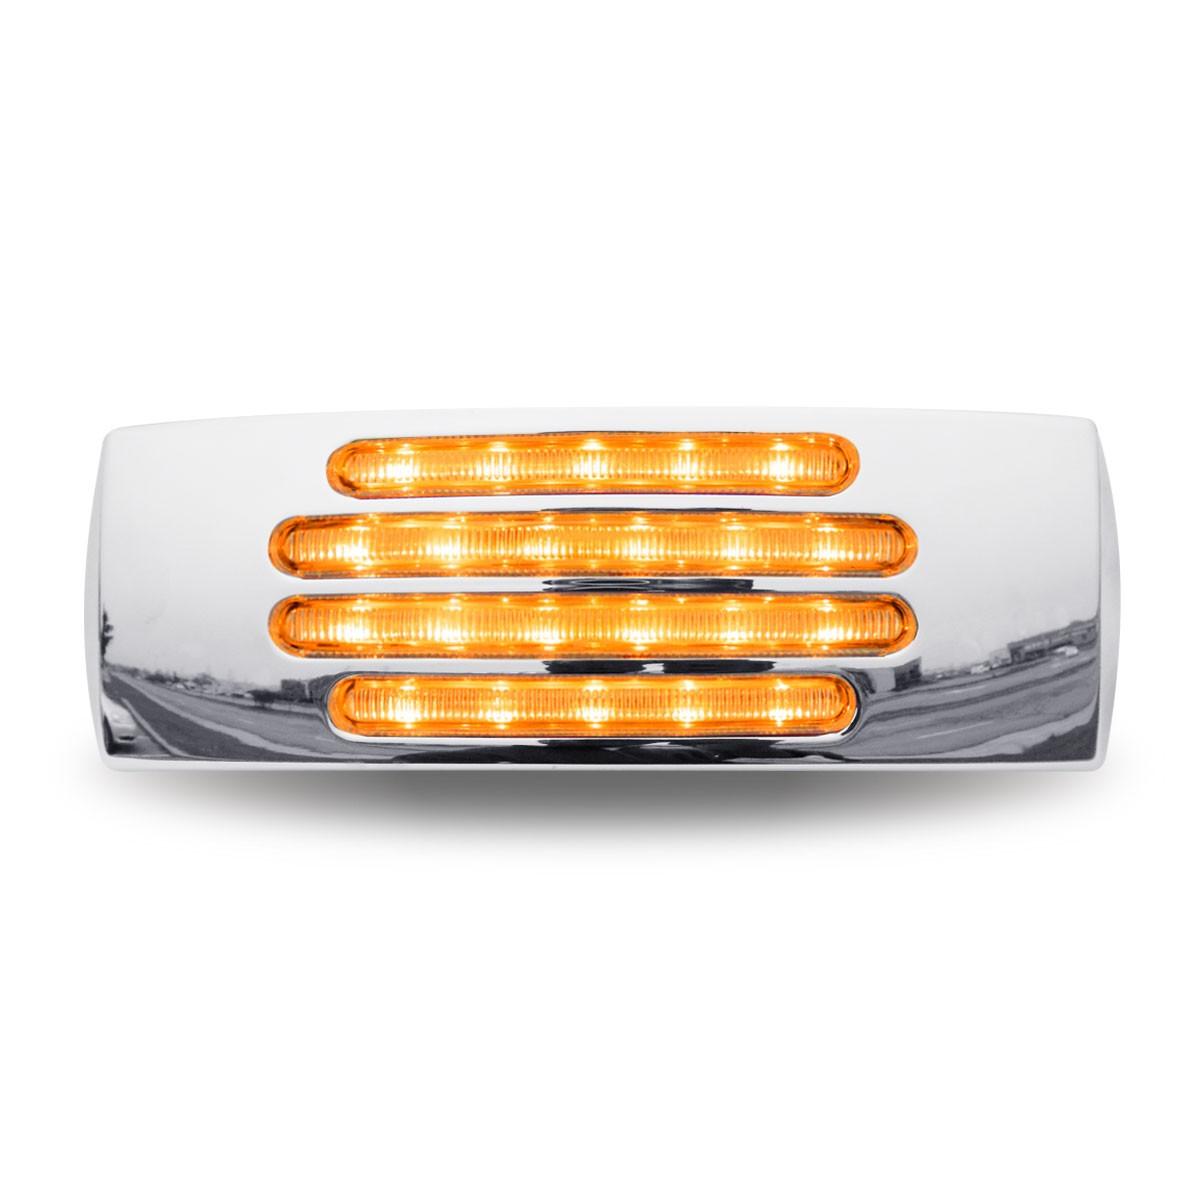 Flatline Rectangular Marker Clearance Light -  Amber LED With Clear Lens